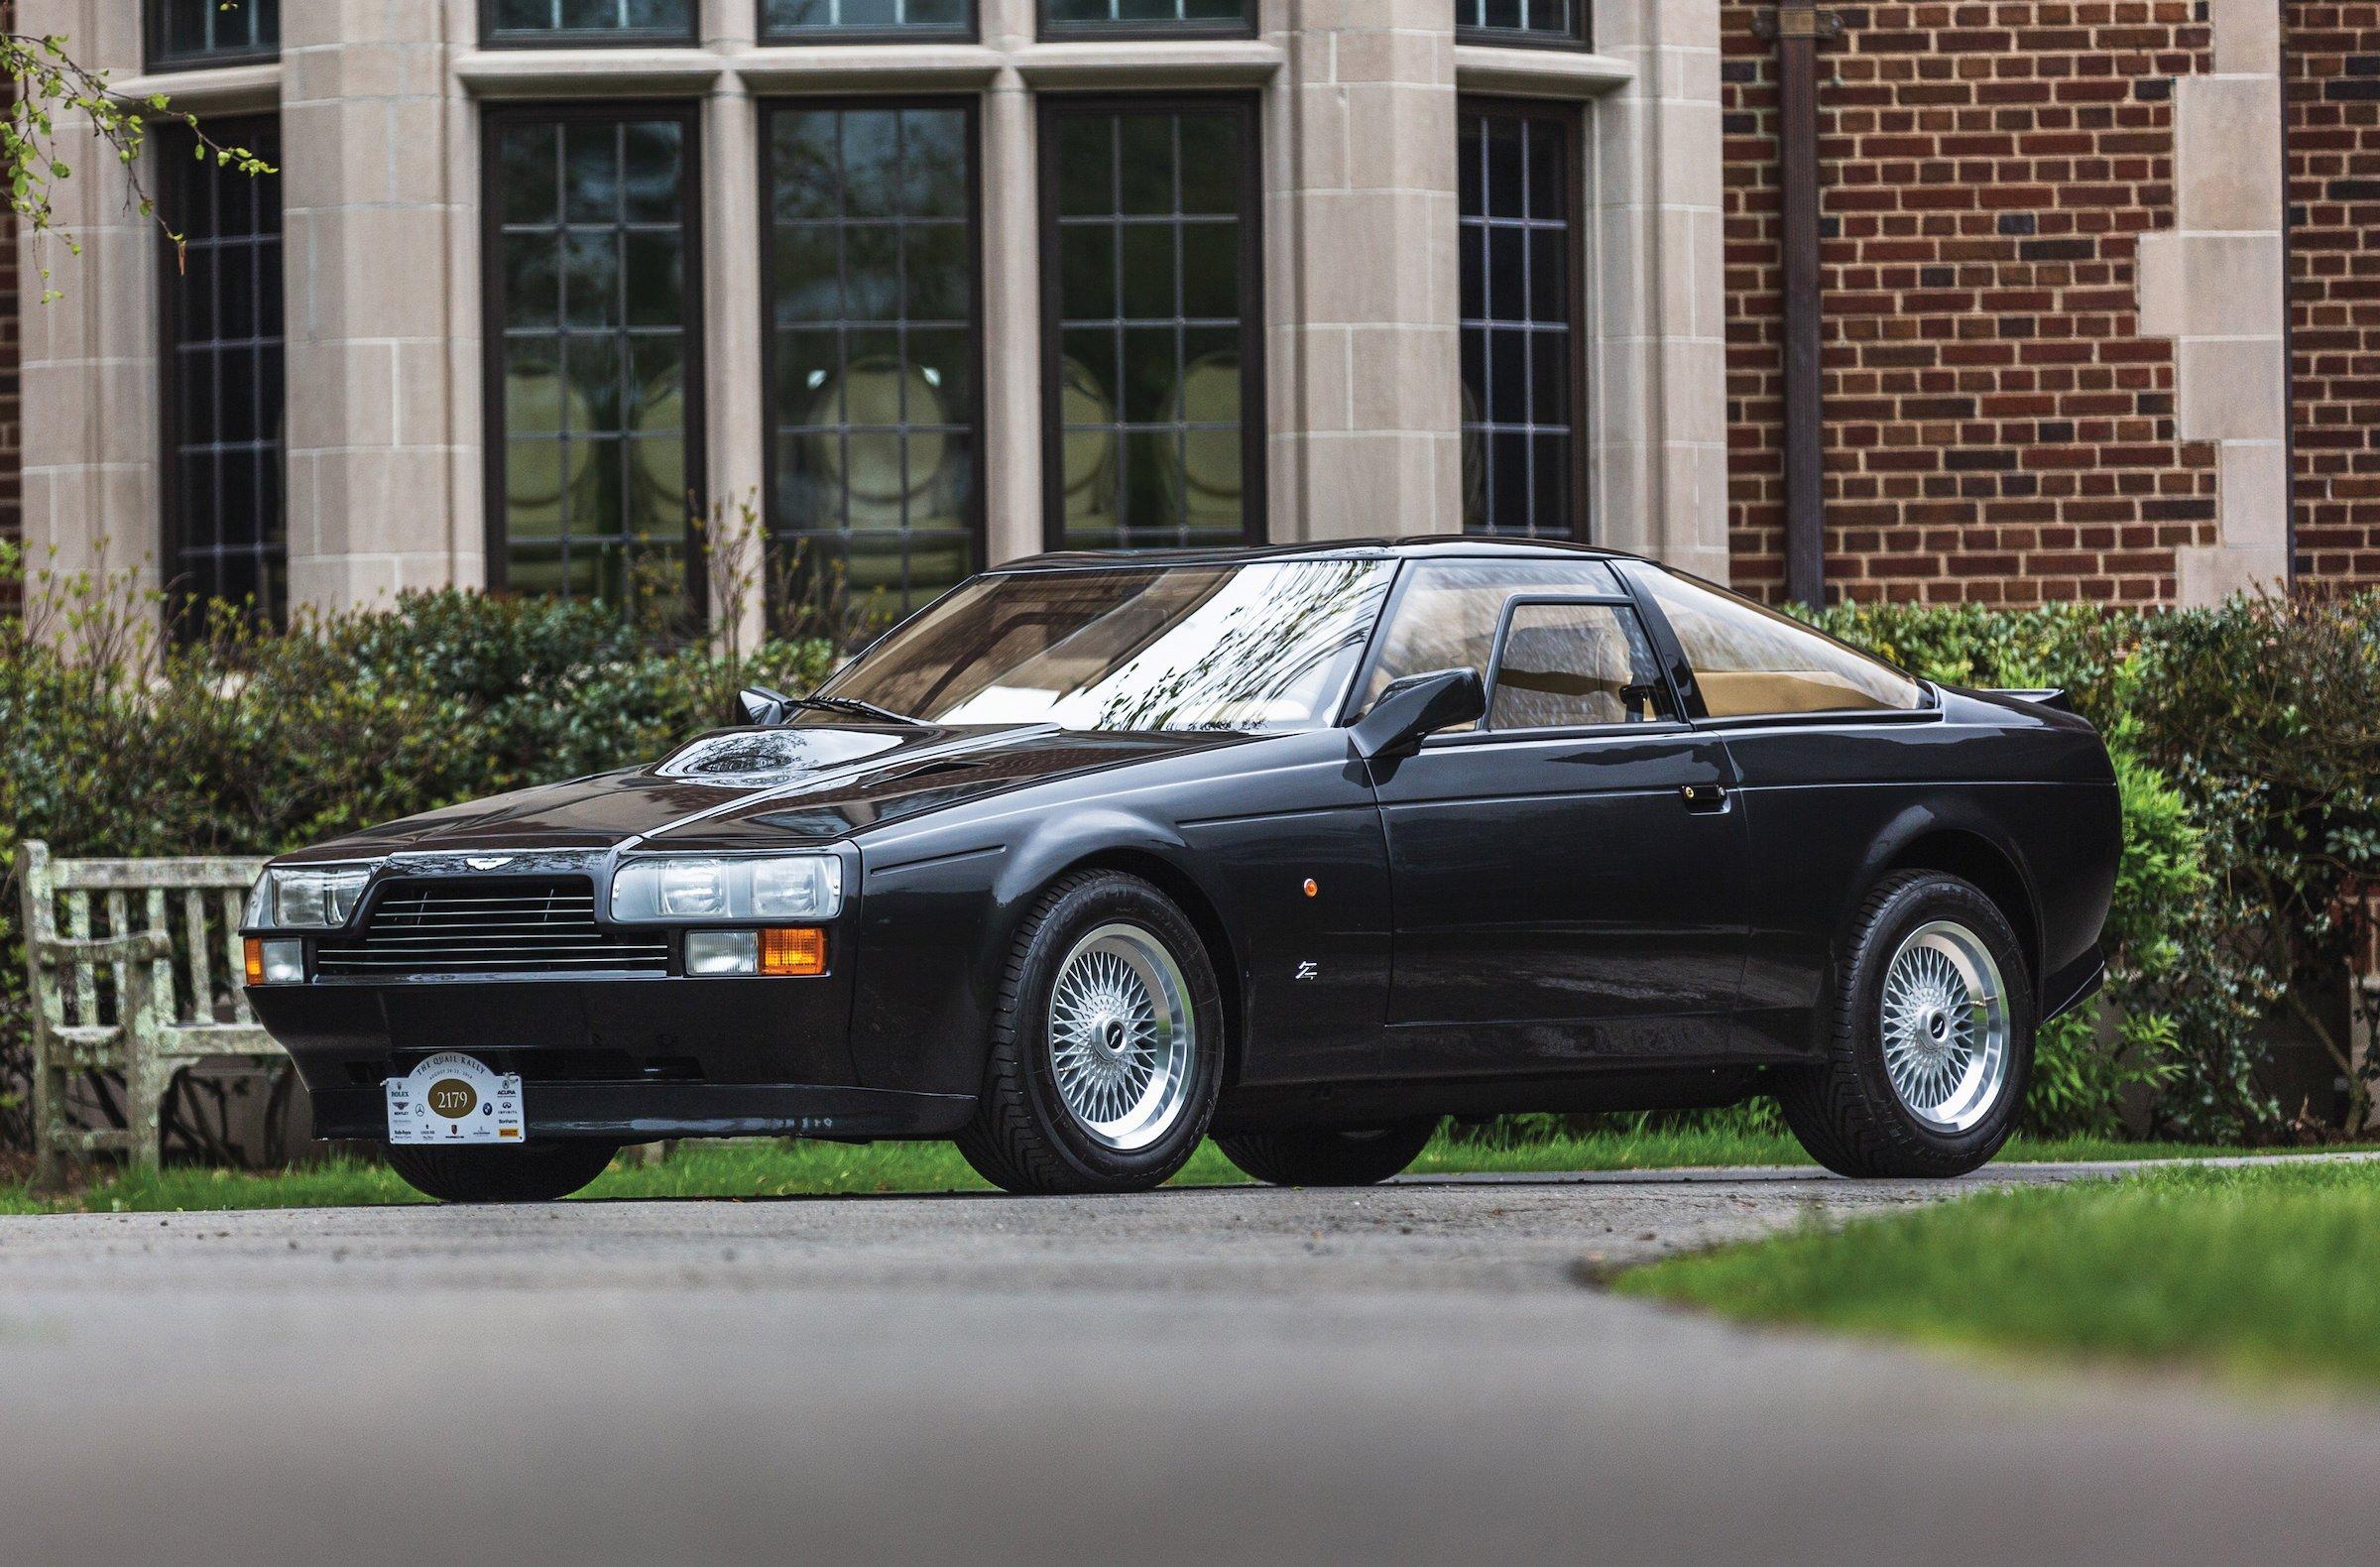 The Rare Aston Martin V8 Vantage Zagato An 1980s Supercar Fighter